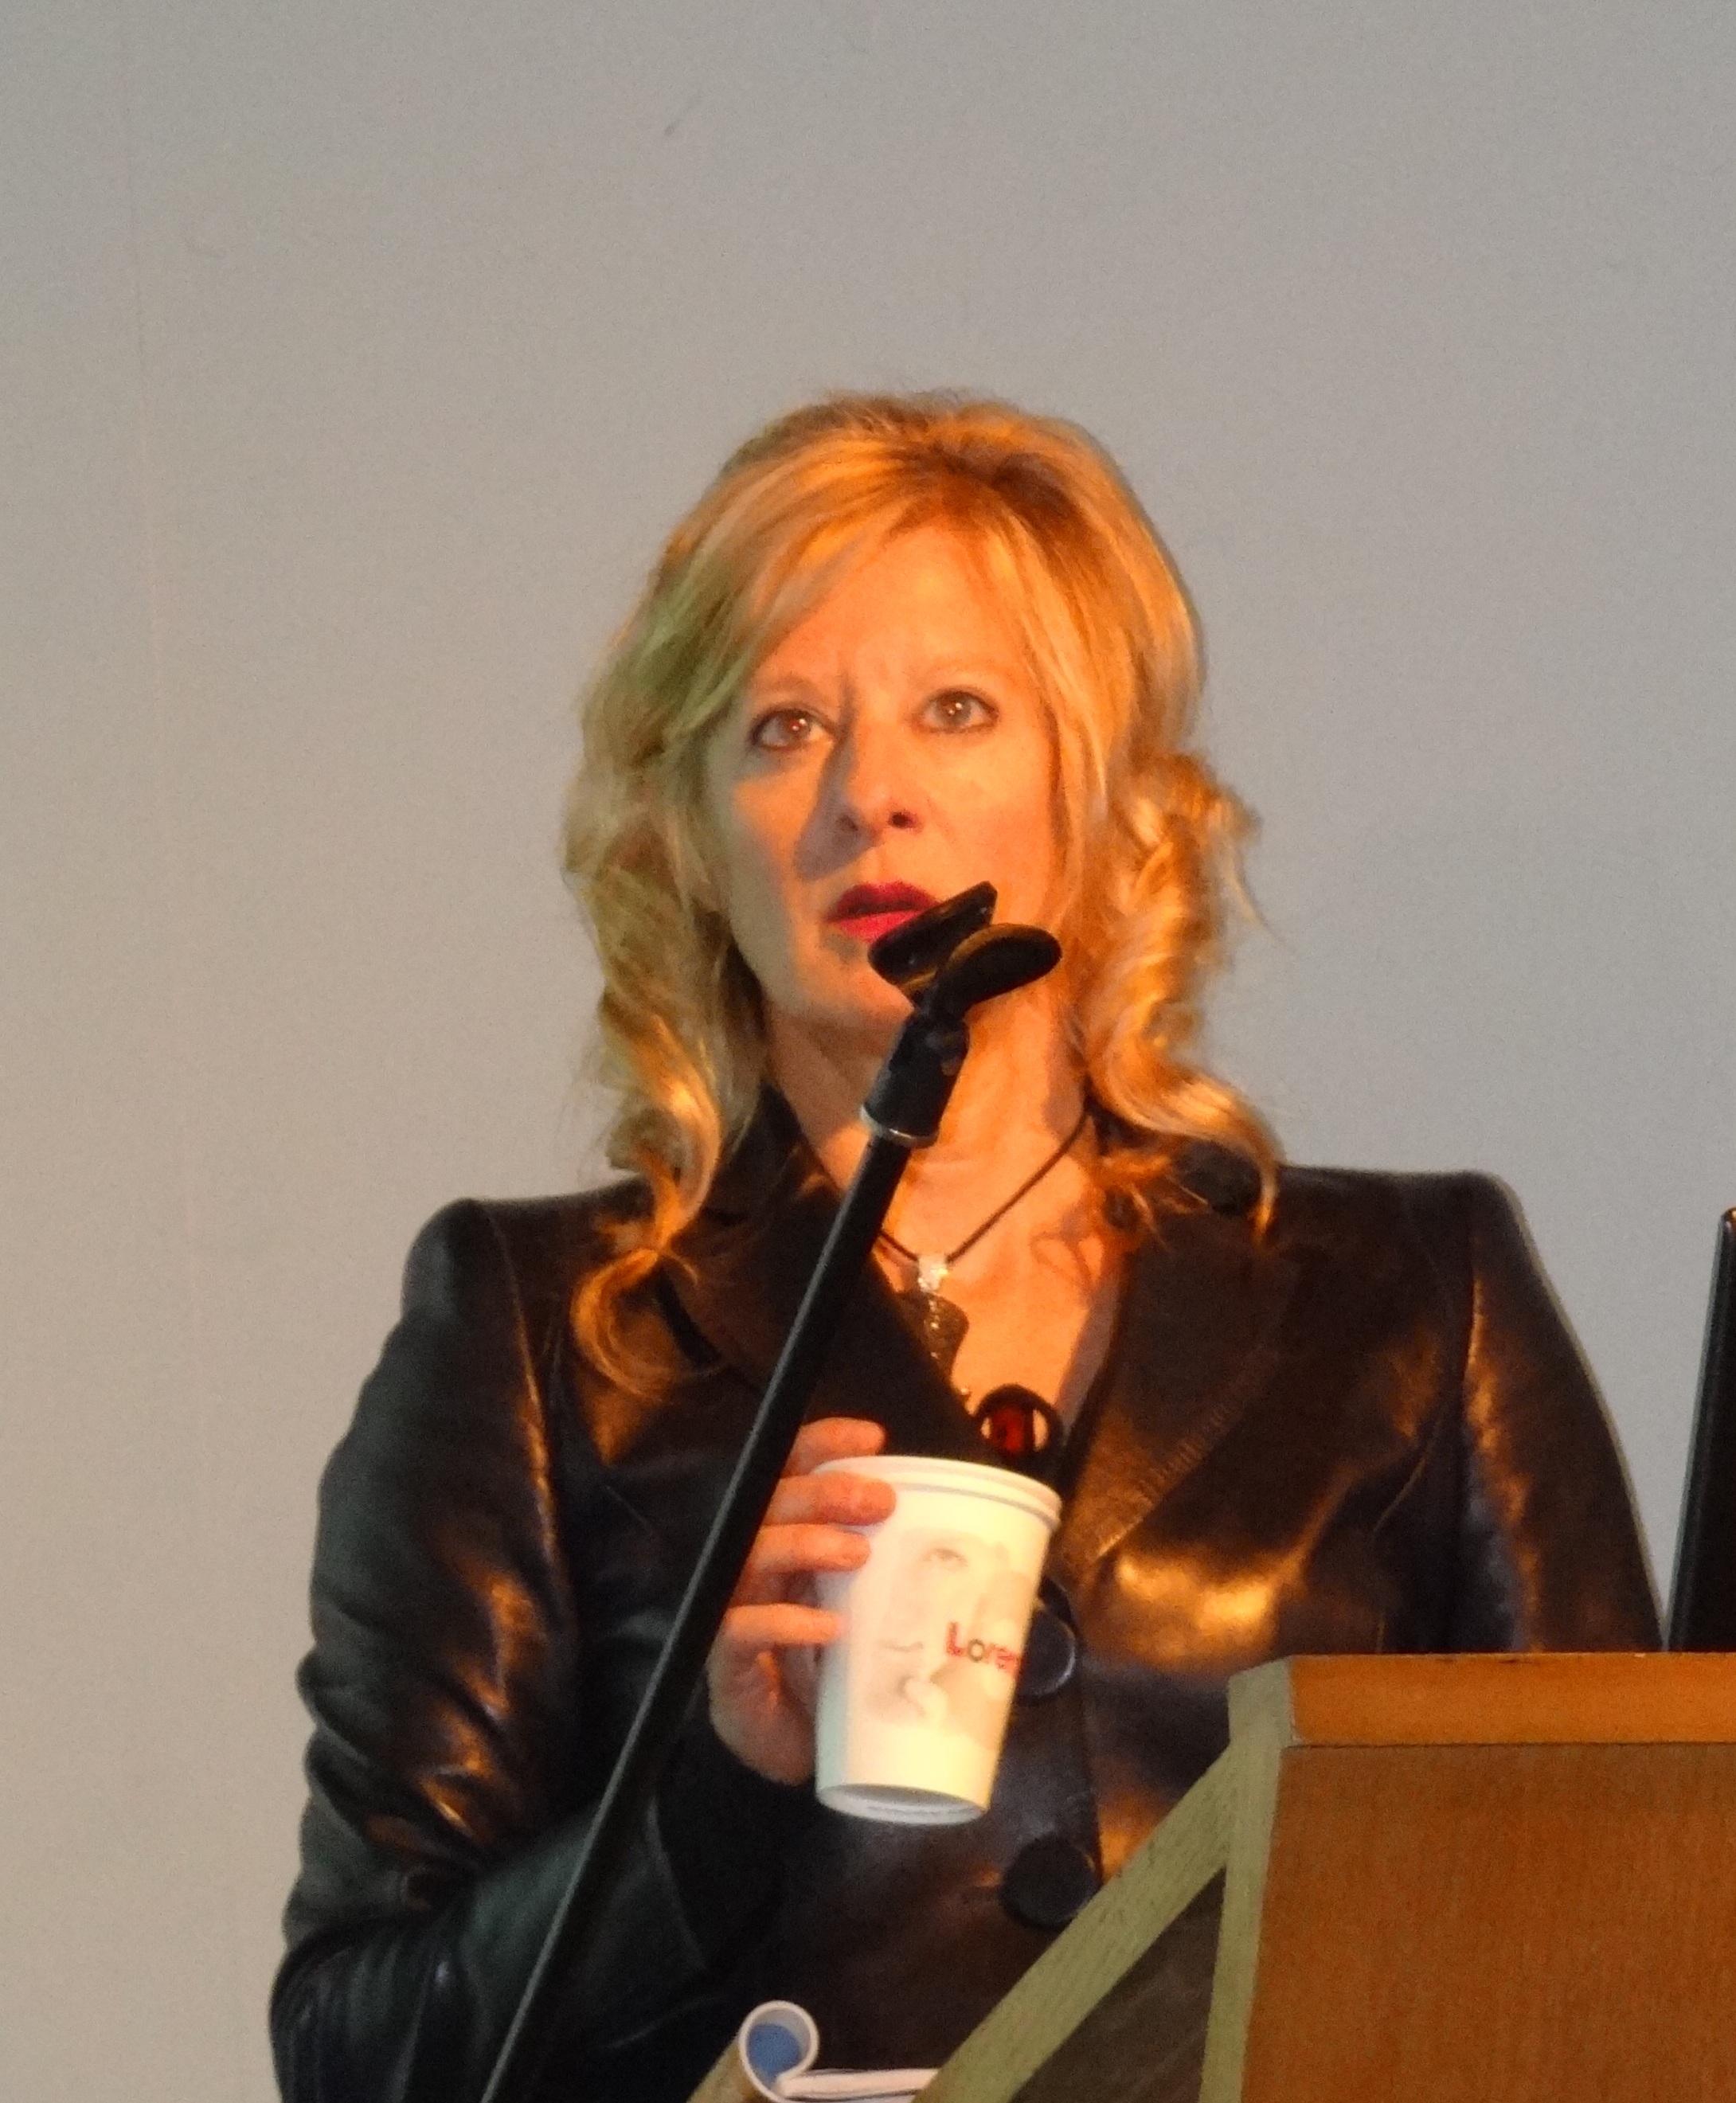 Image of Alison Jackson from Wikidata